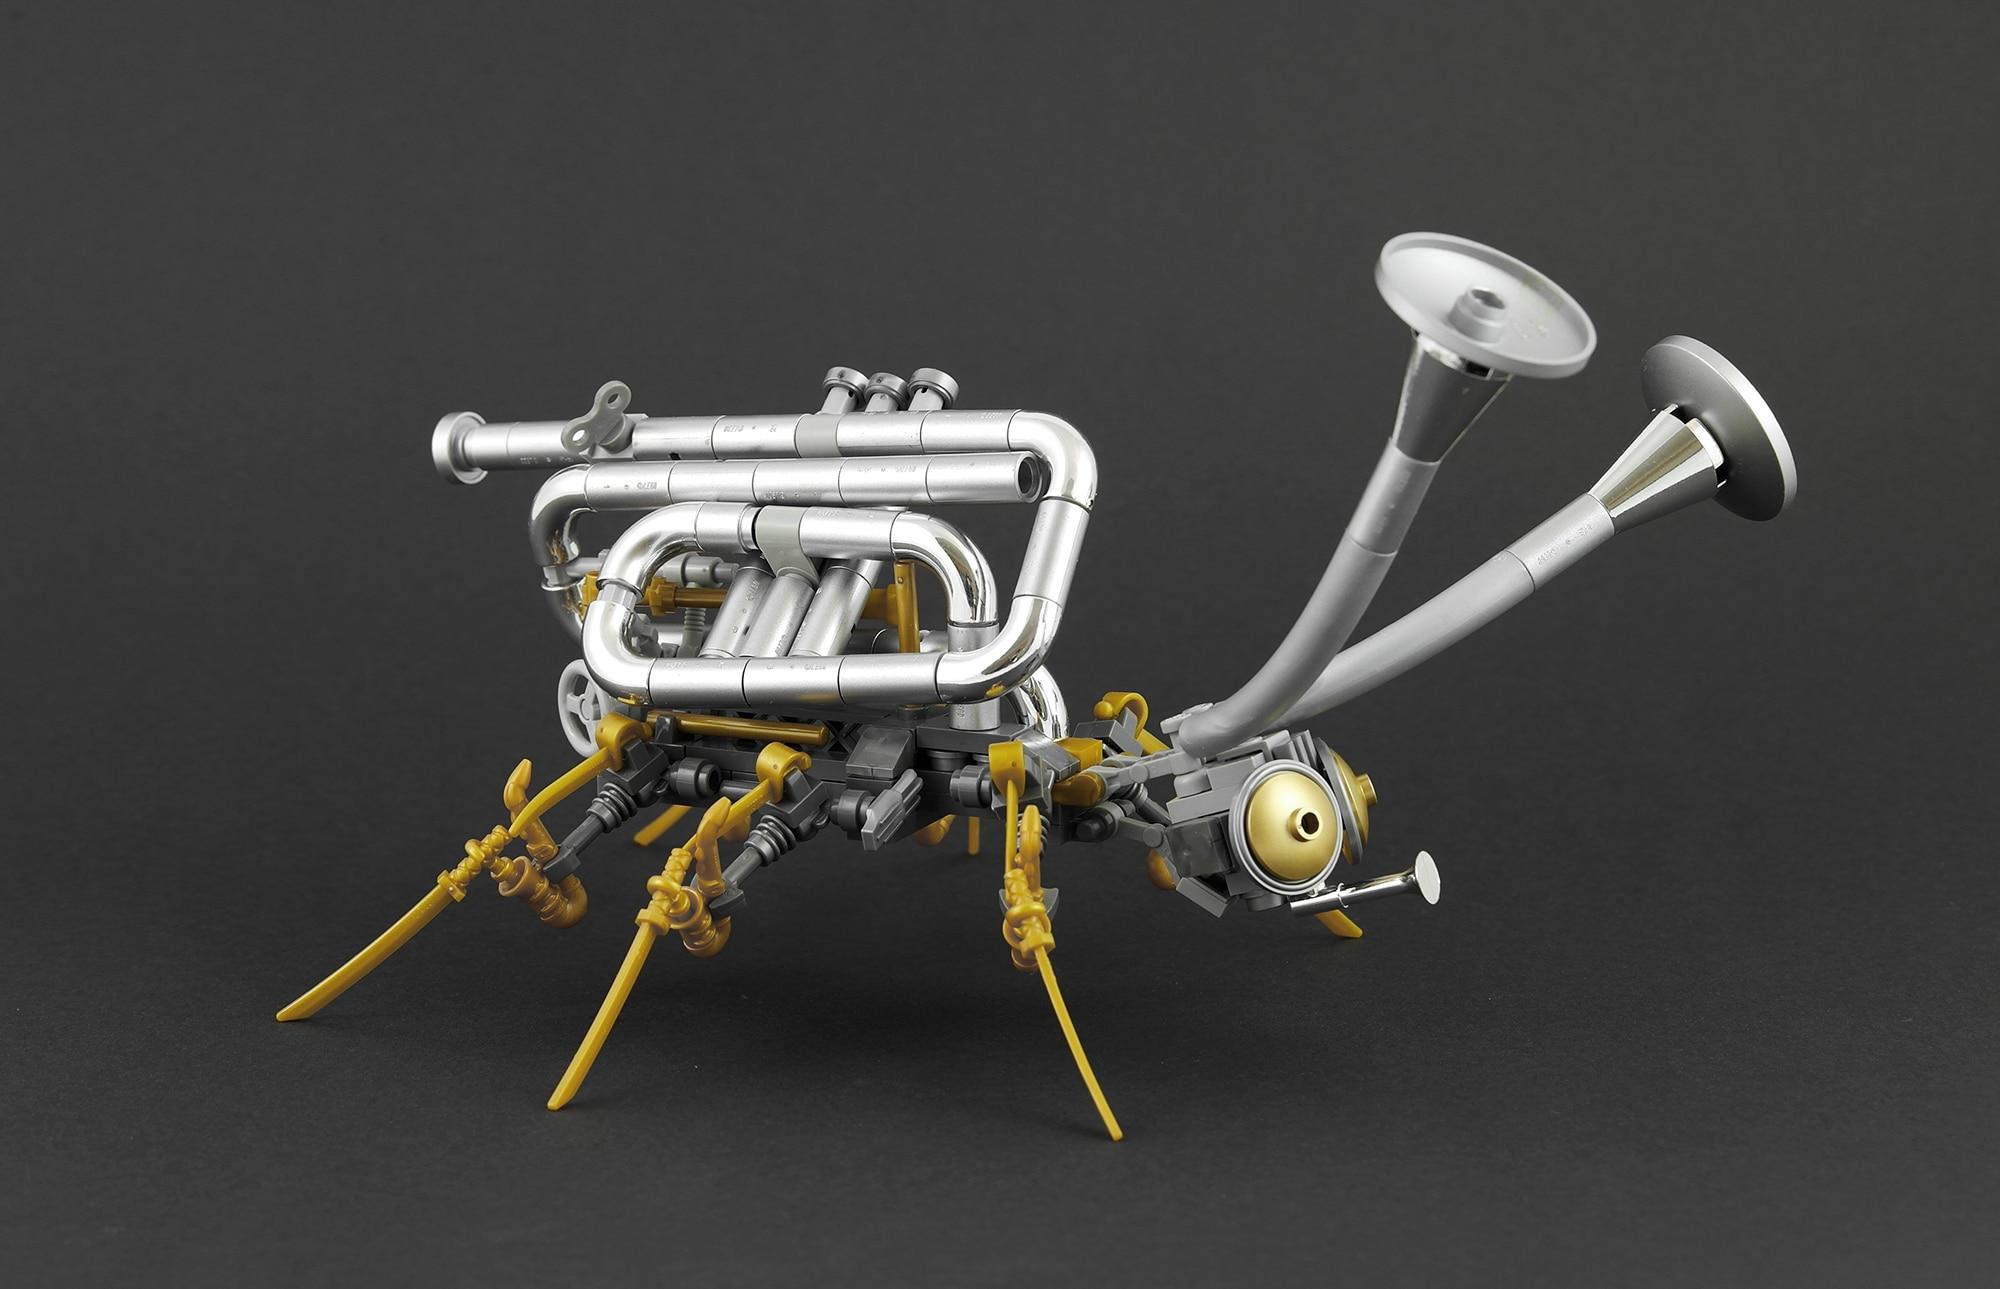 LEGO Moc Iron Builder 2016 Steampunk Kaefer